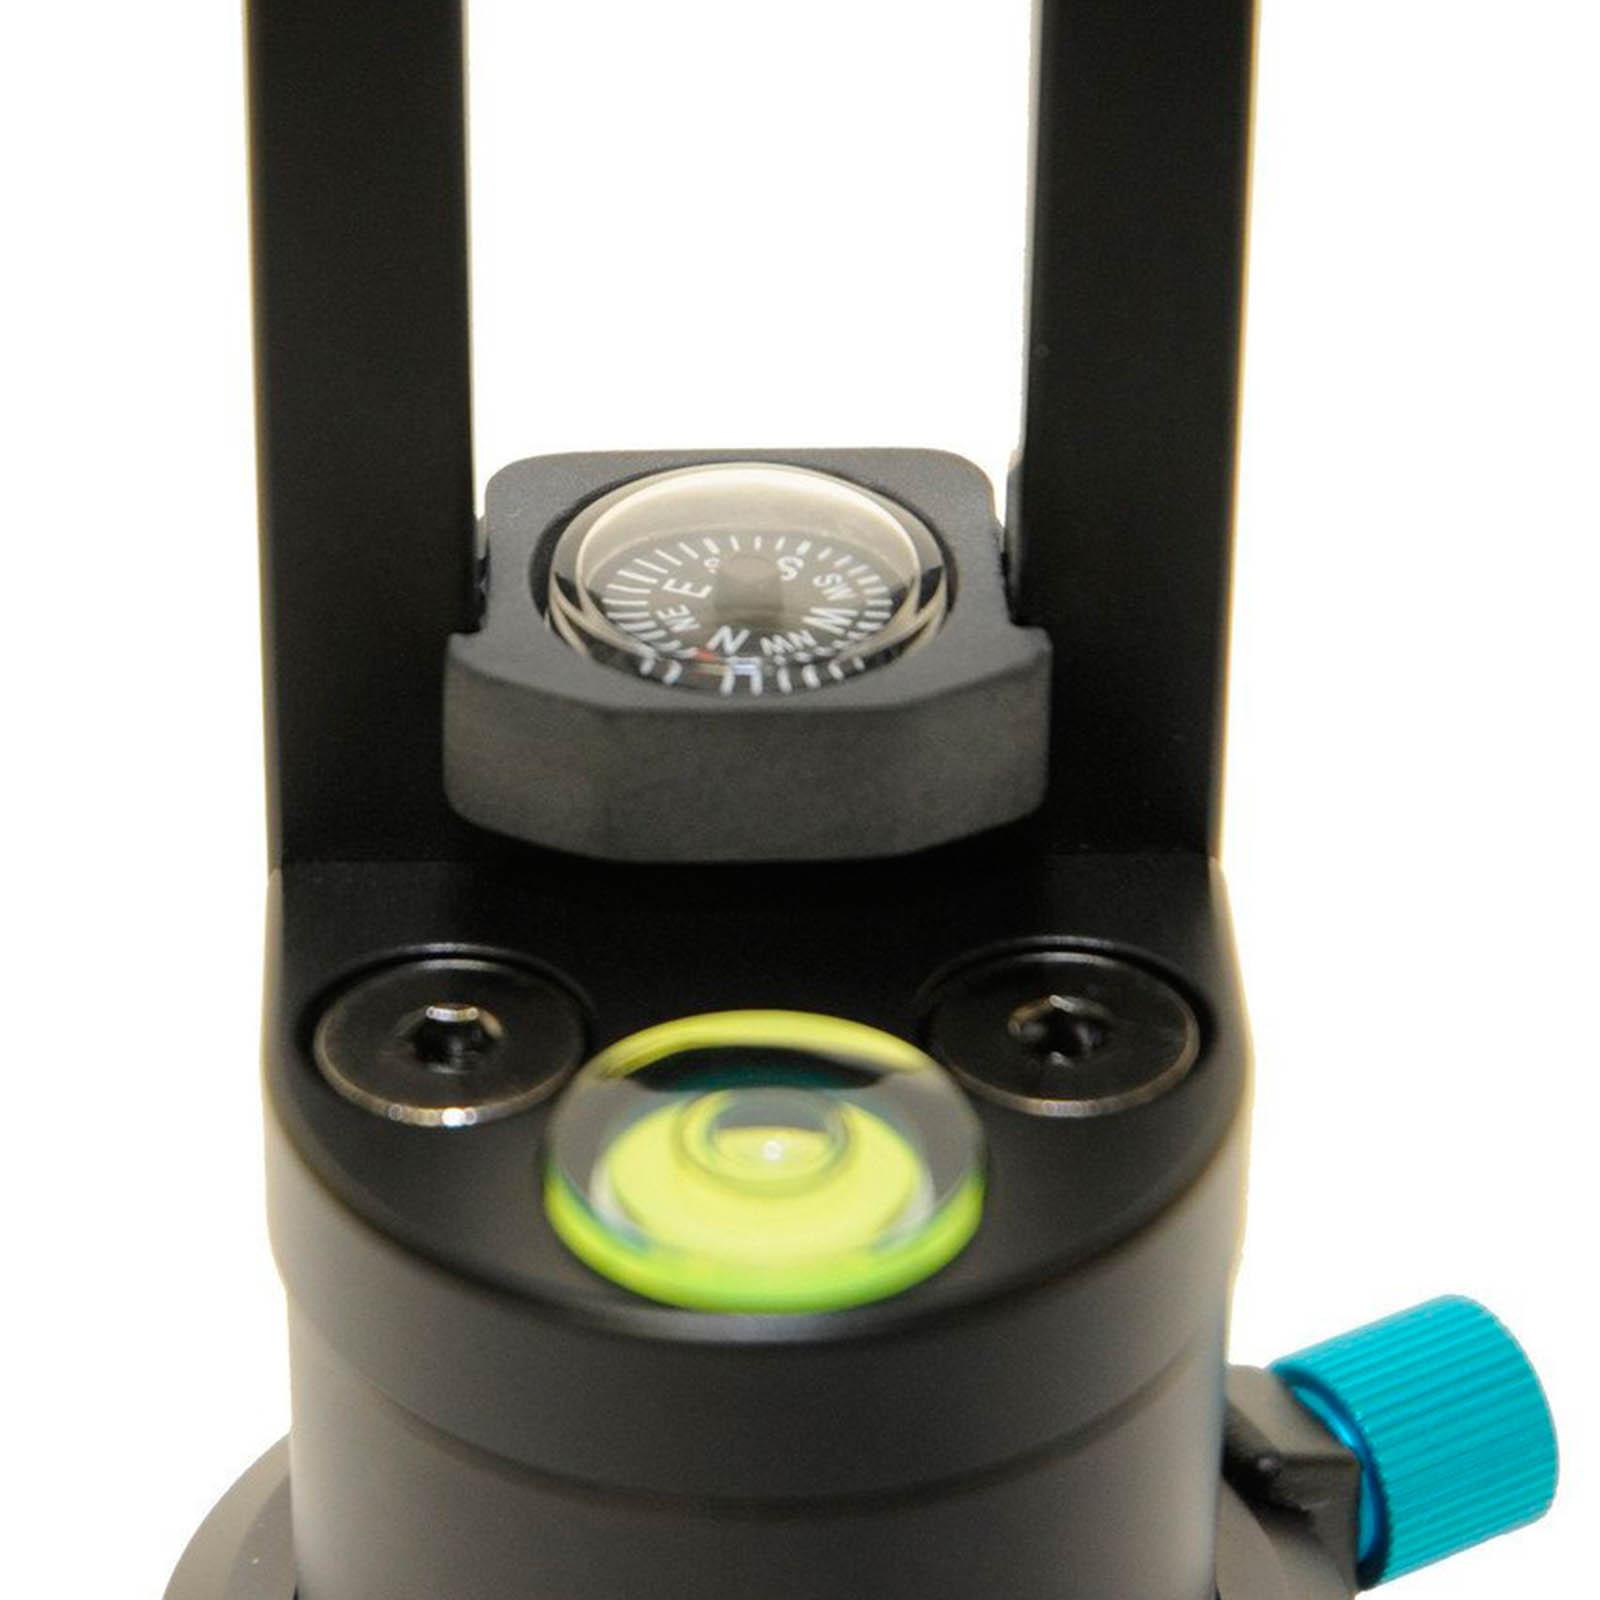 360dictos Nodal Ninja R20 - F0015